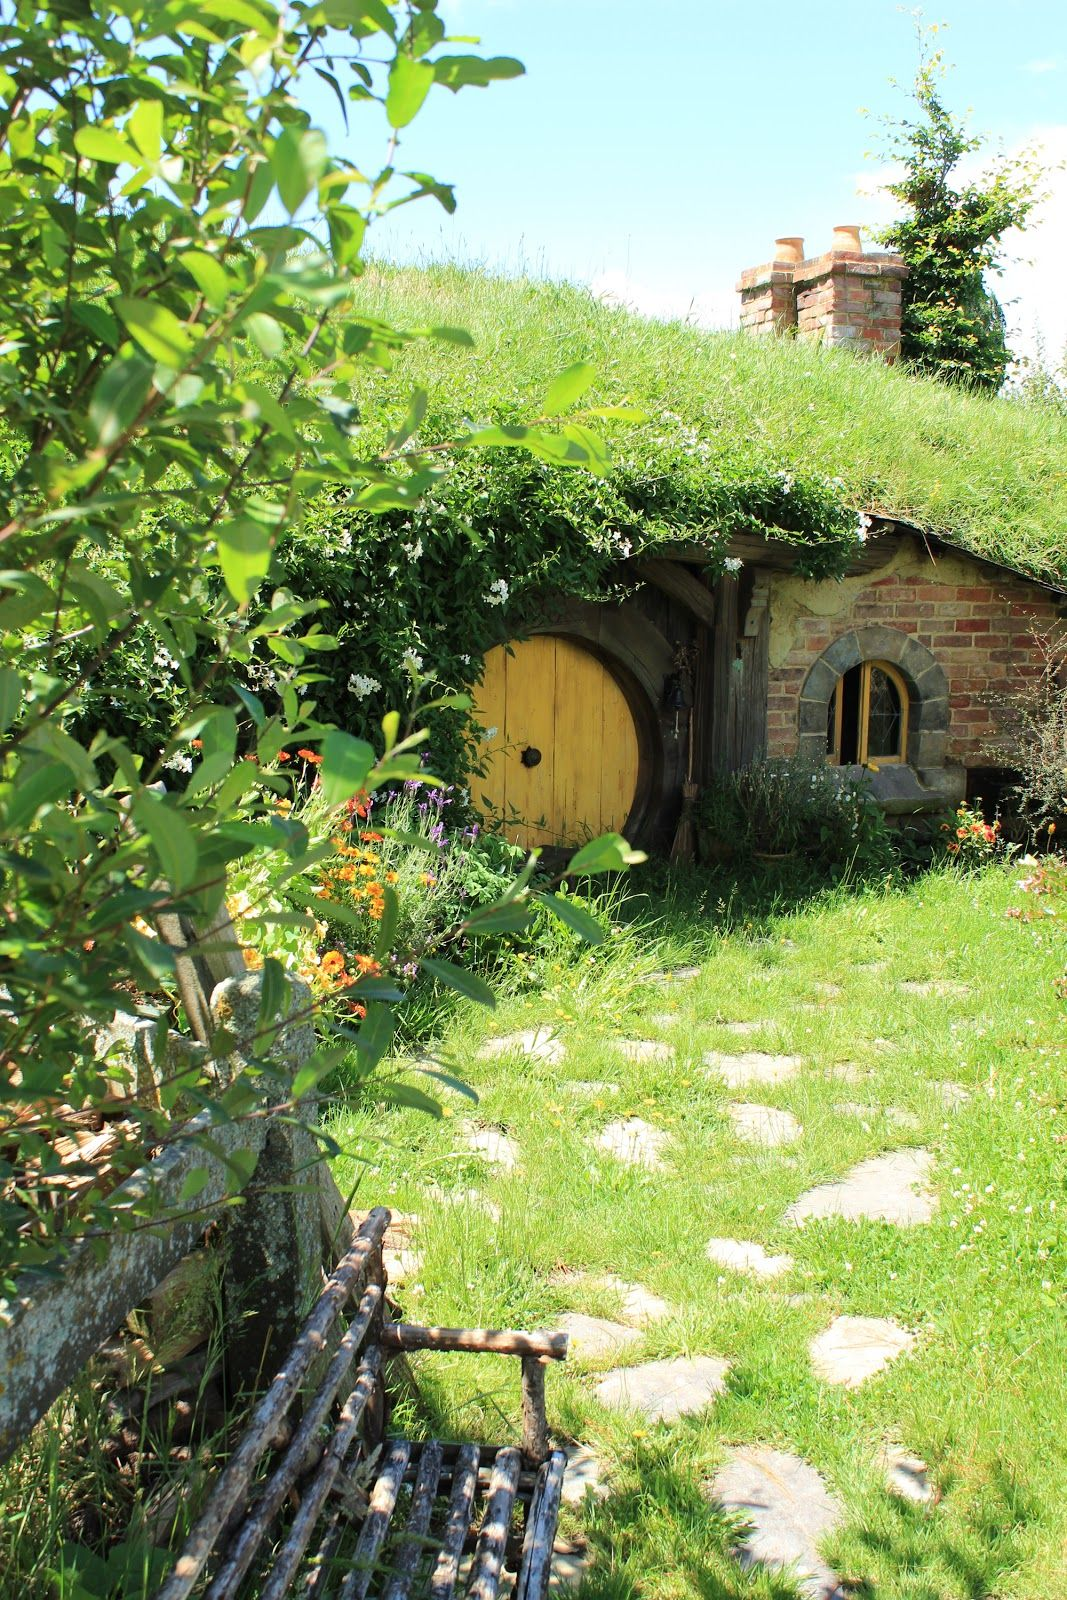 New Zealand Part 4 - Hobbiton (With images) | Landscape ...